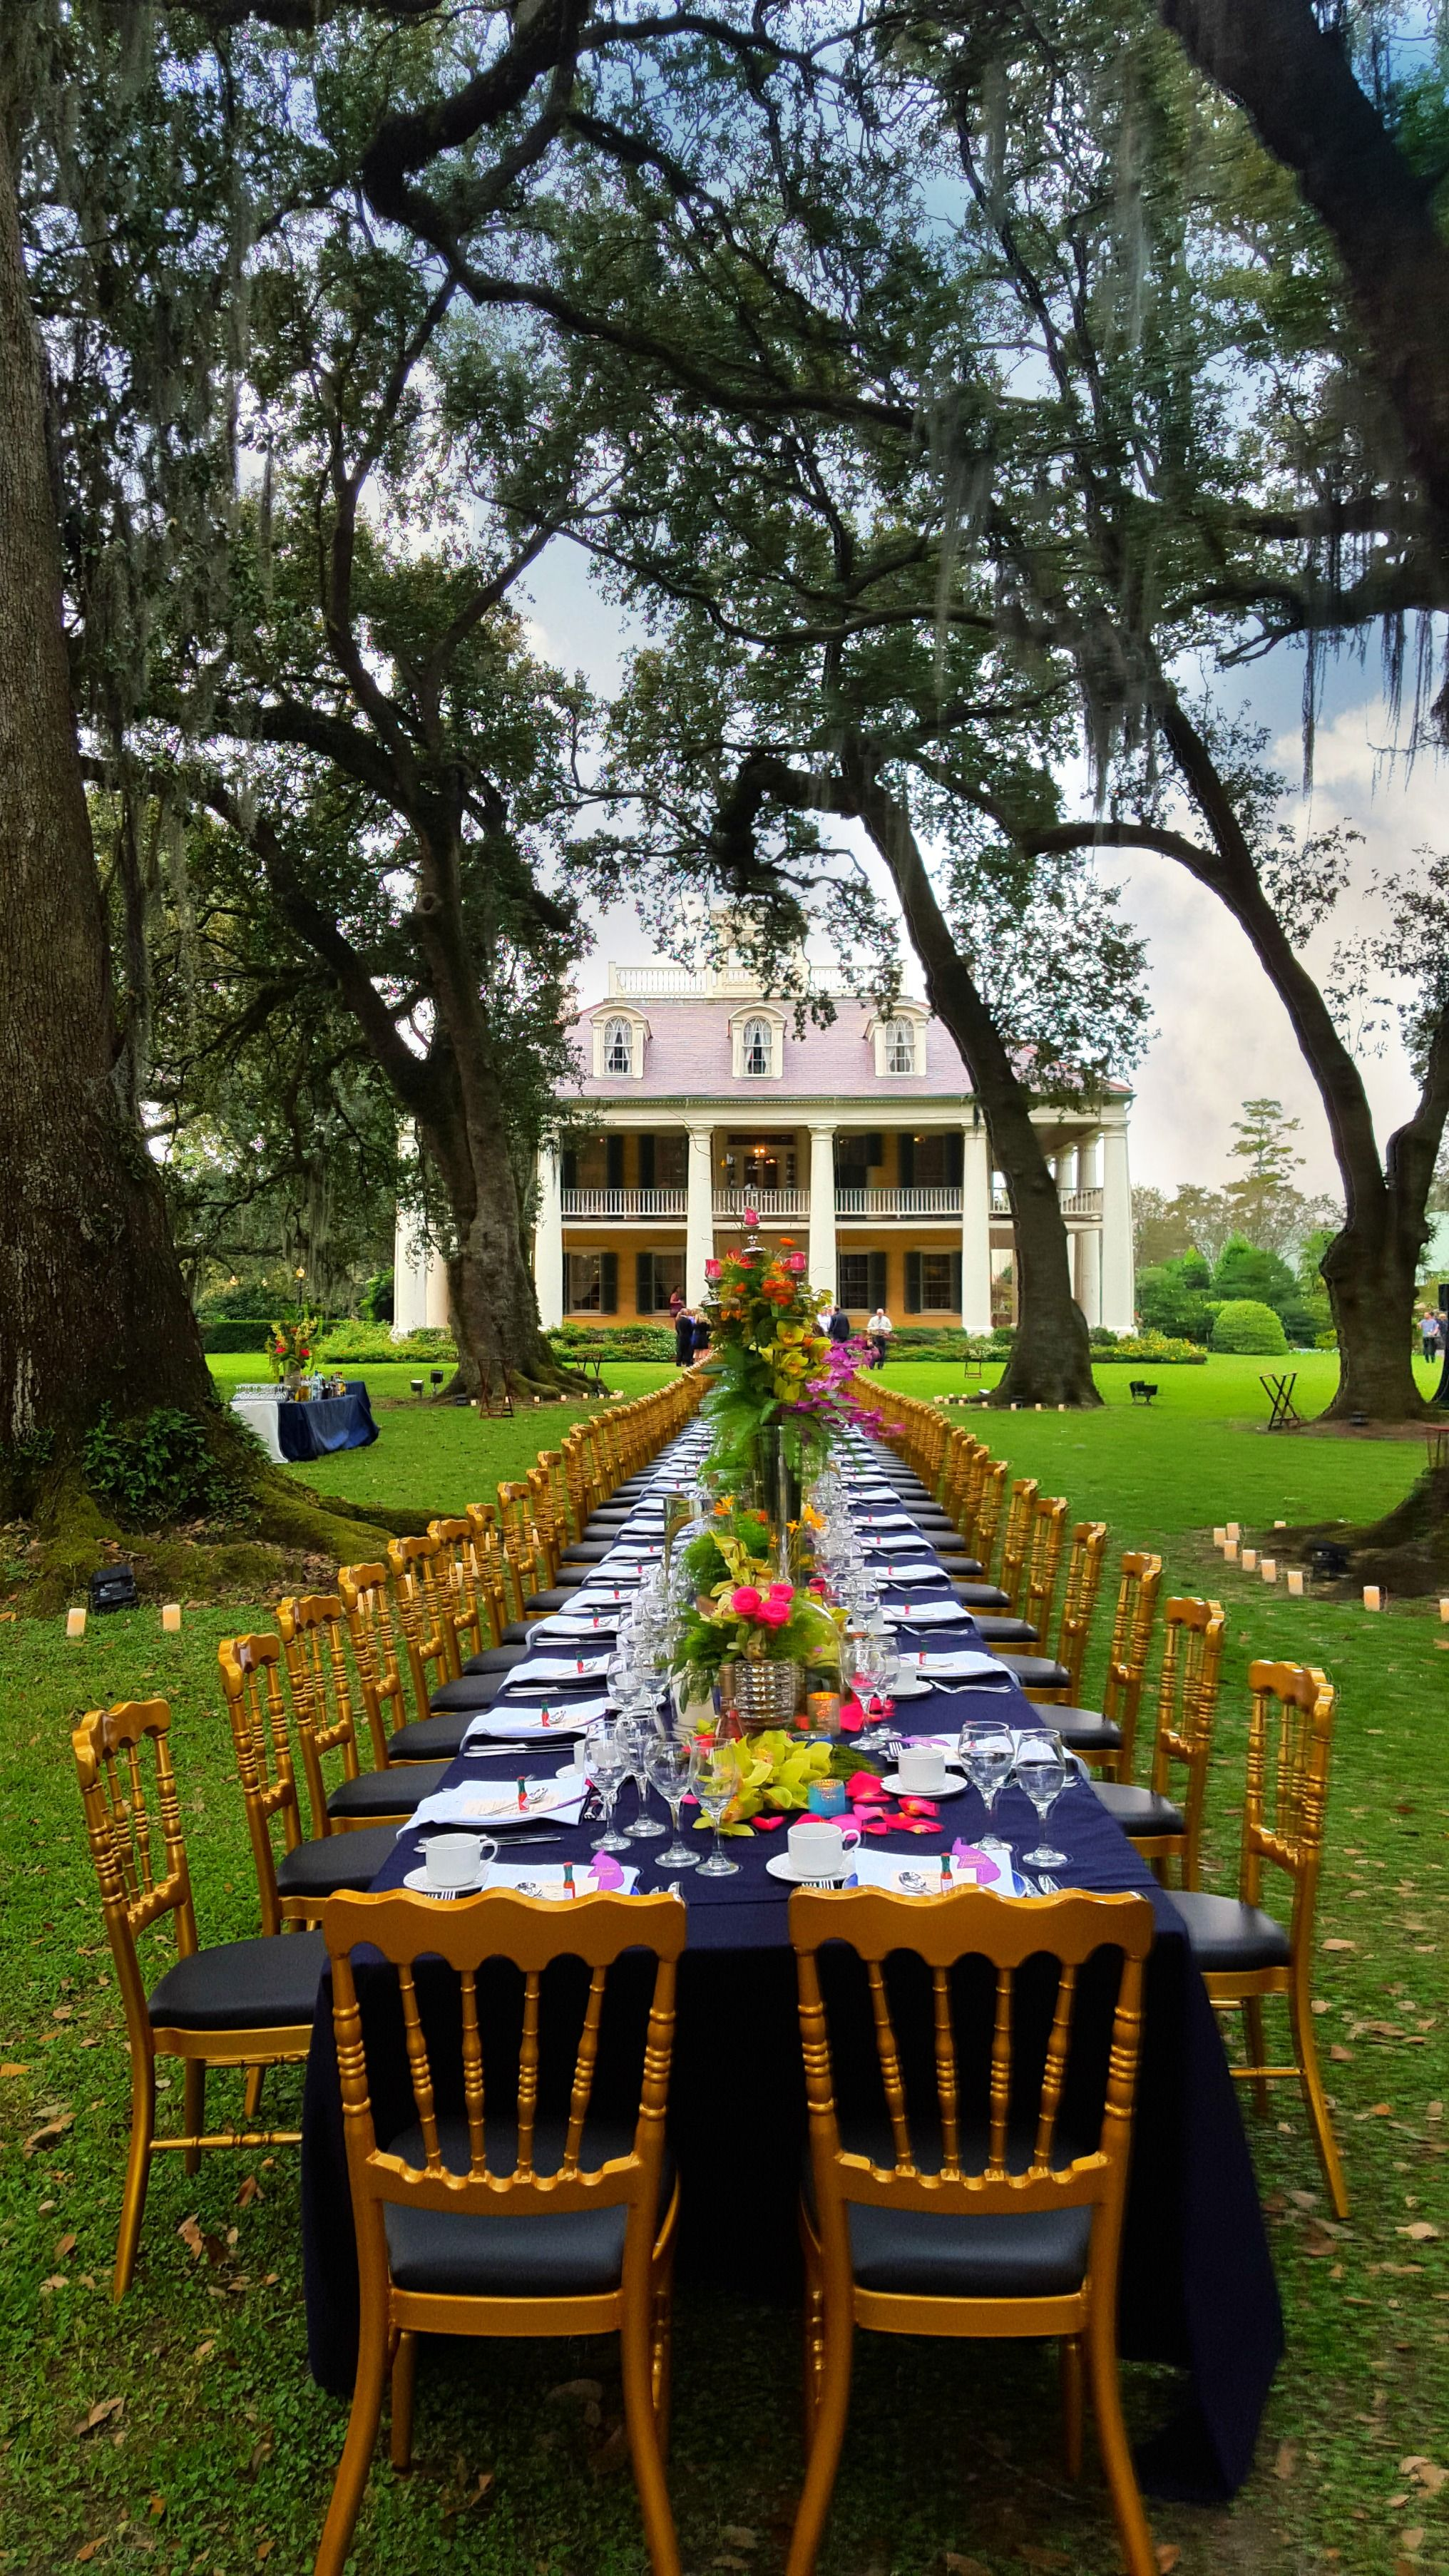 babc2a4dc50db7eb3b79e081ff977521 - Houmas House Plantation And Gardens Louisiana